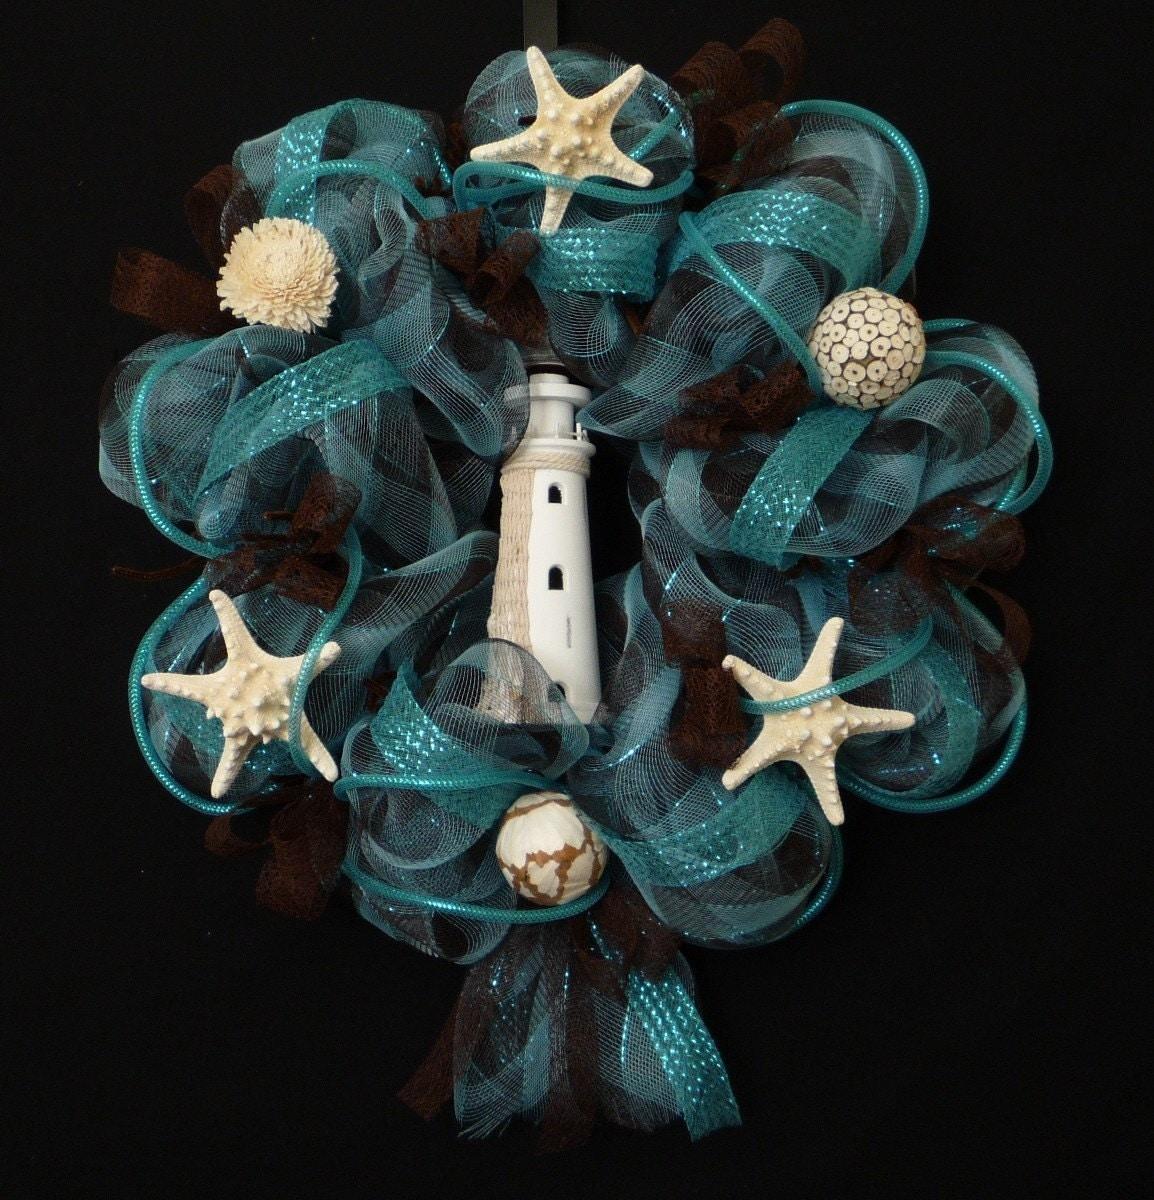 Coral Reef Poly Mesh Beach Wreath Lighthouse Wreath Item